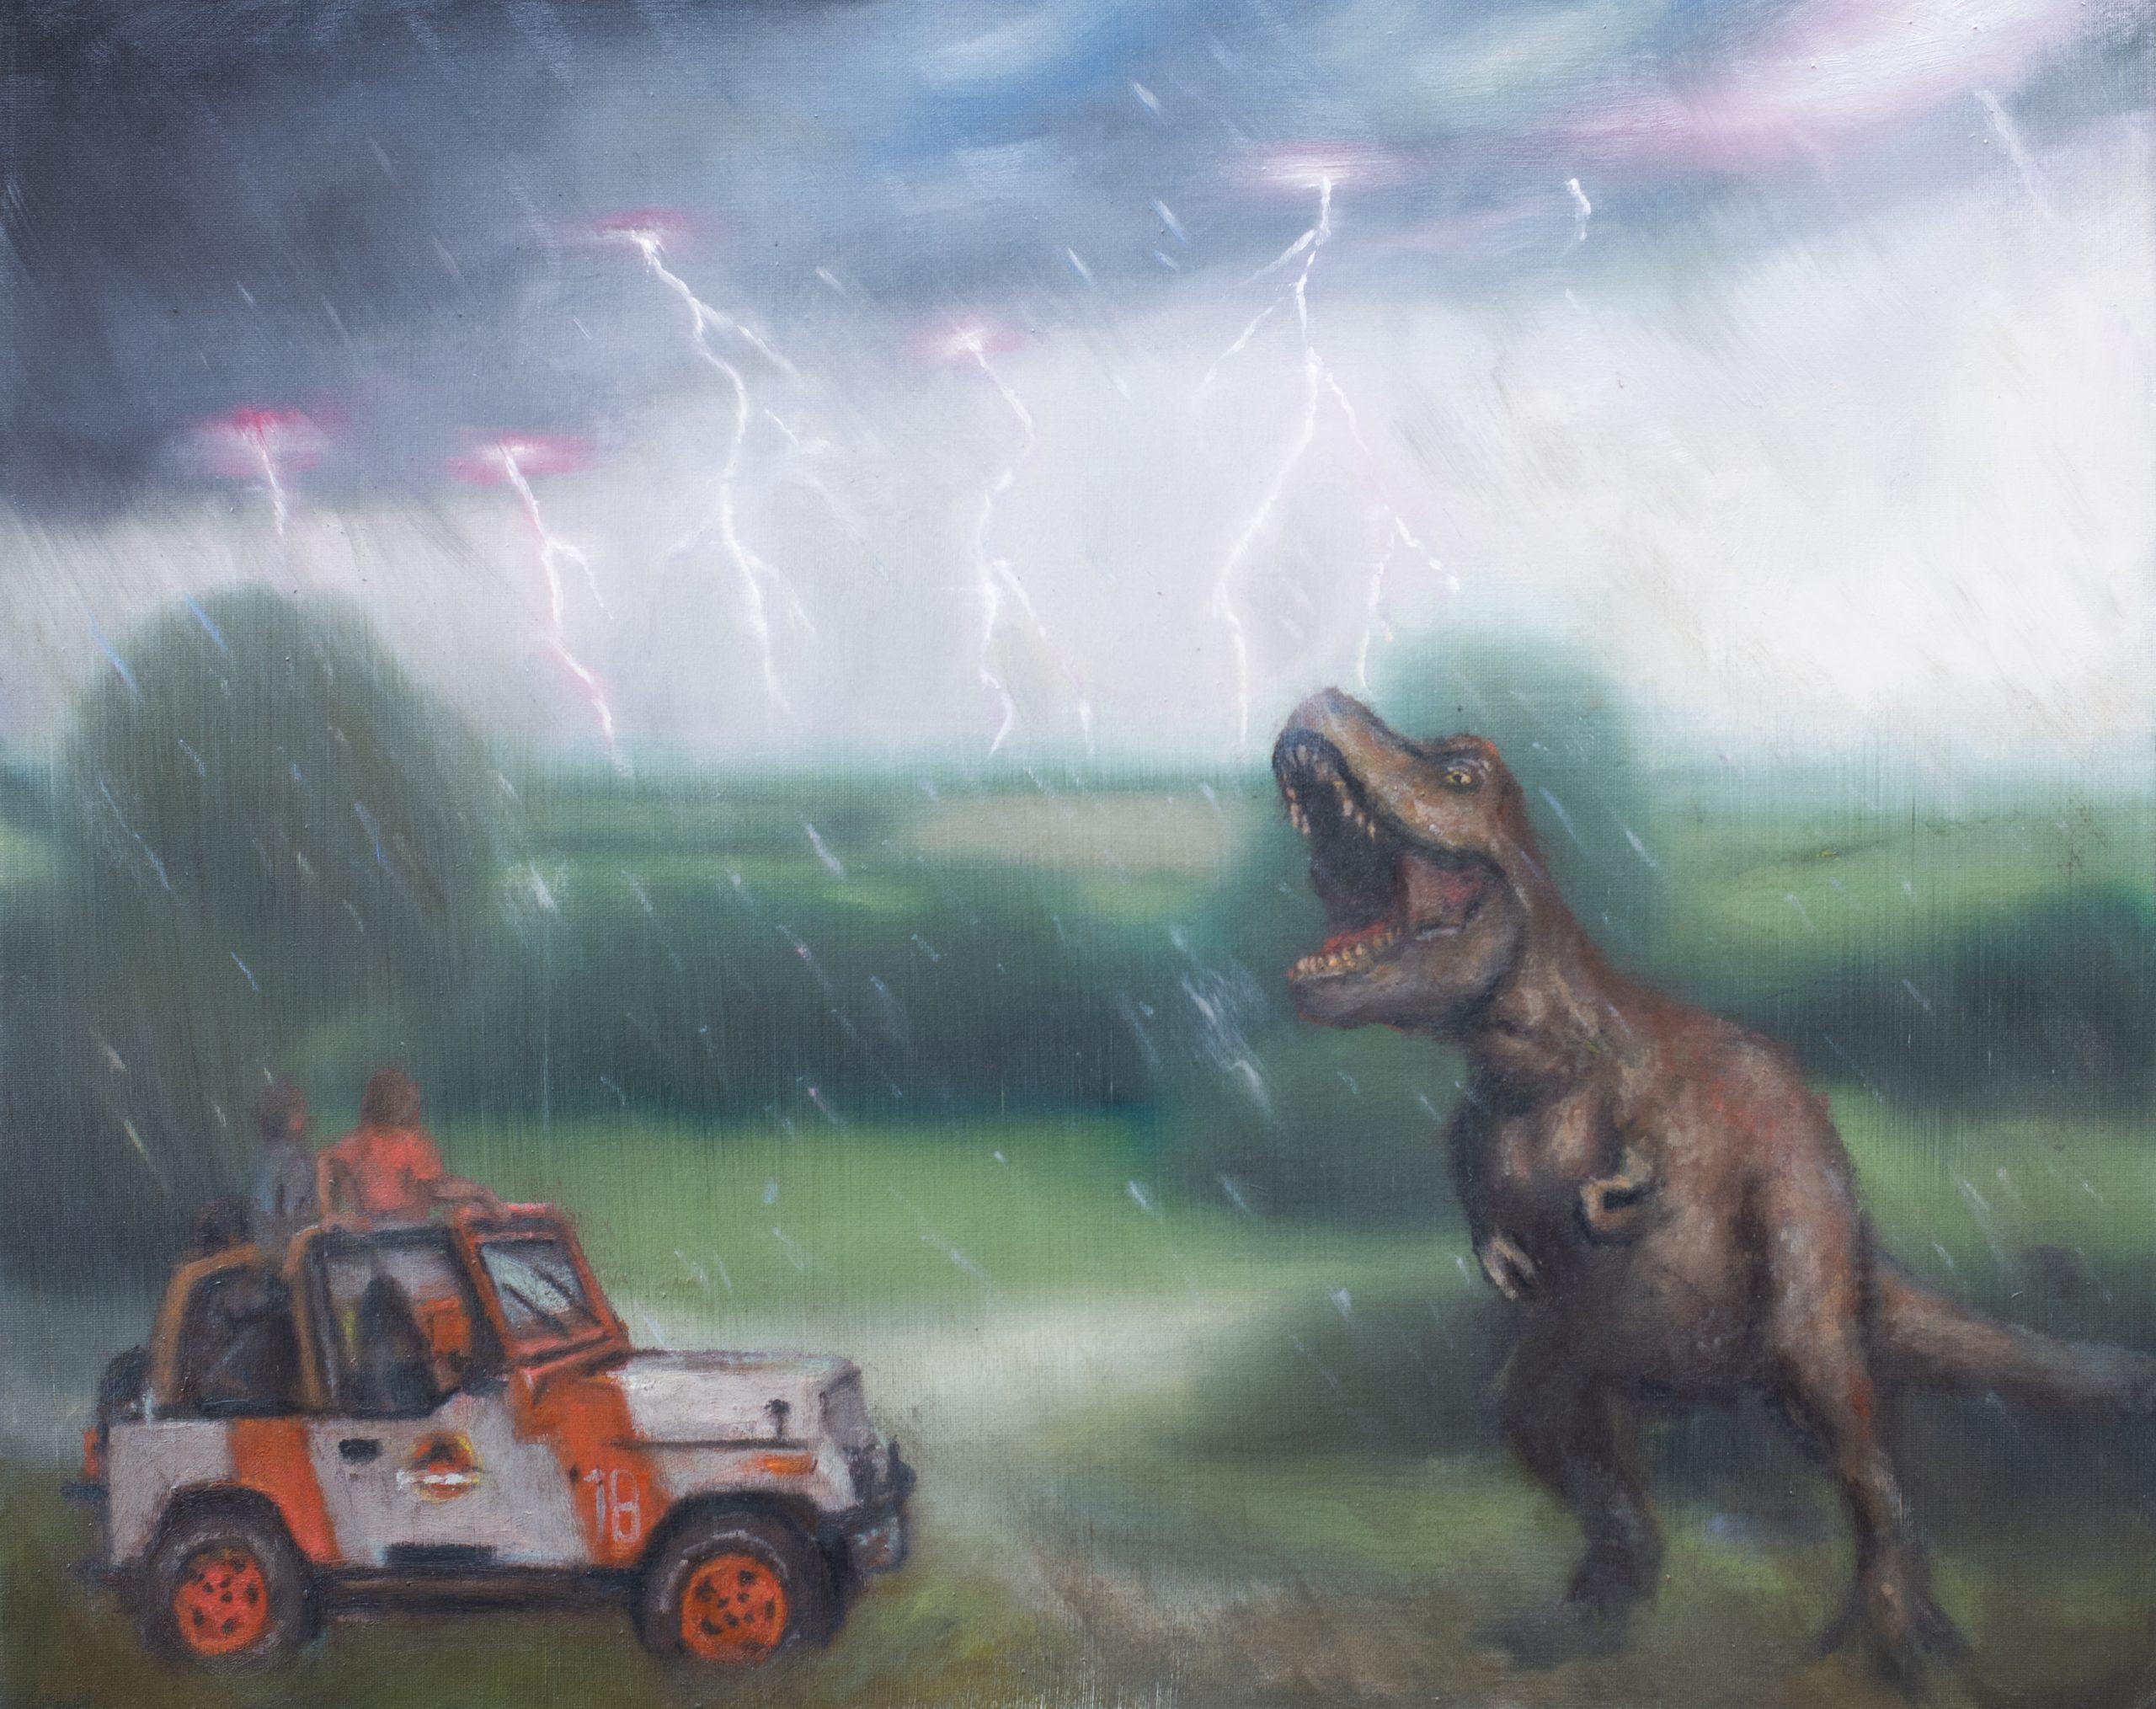 Jurassic Park UK by Tim Gatenby